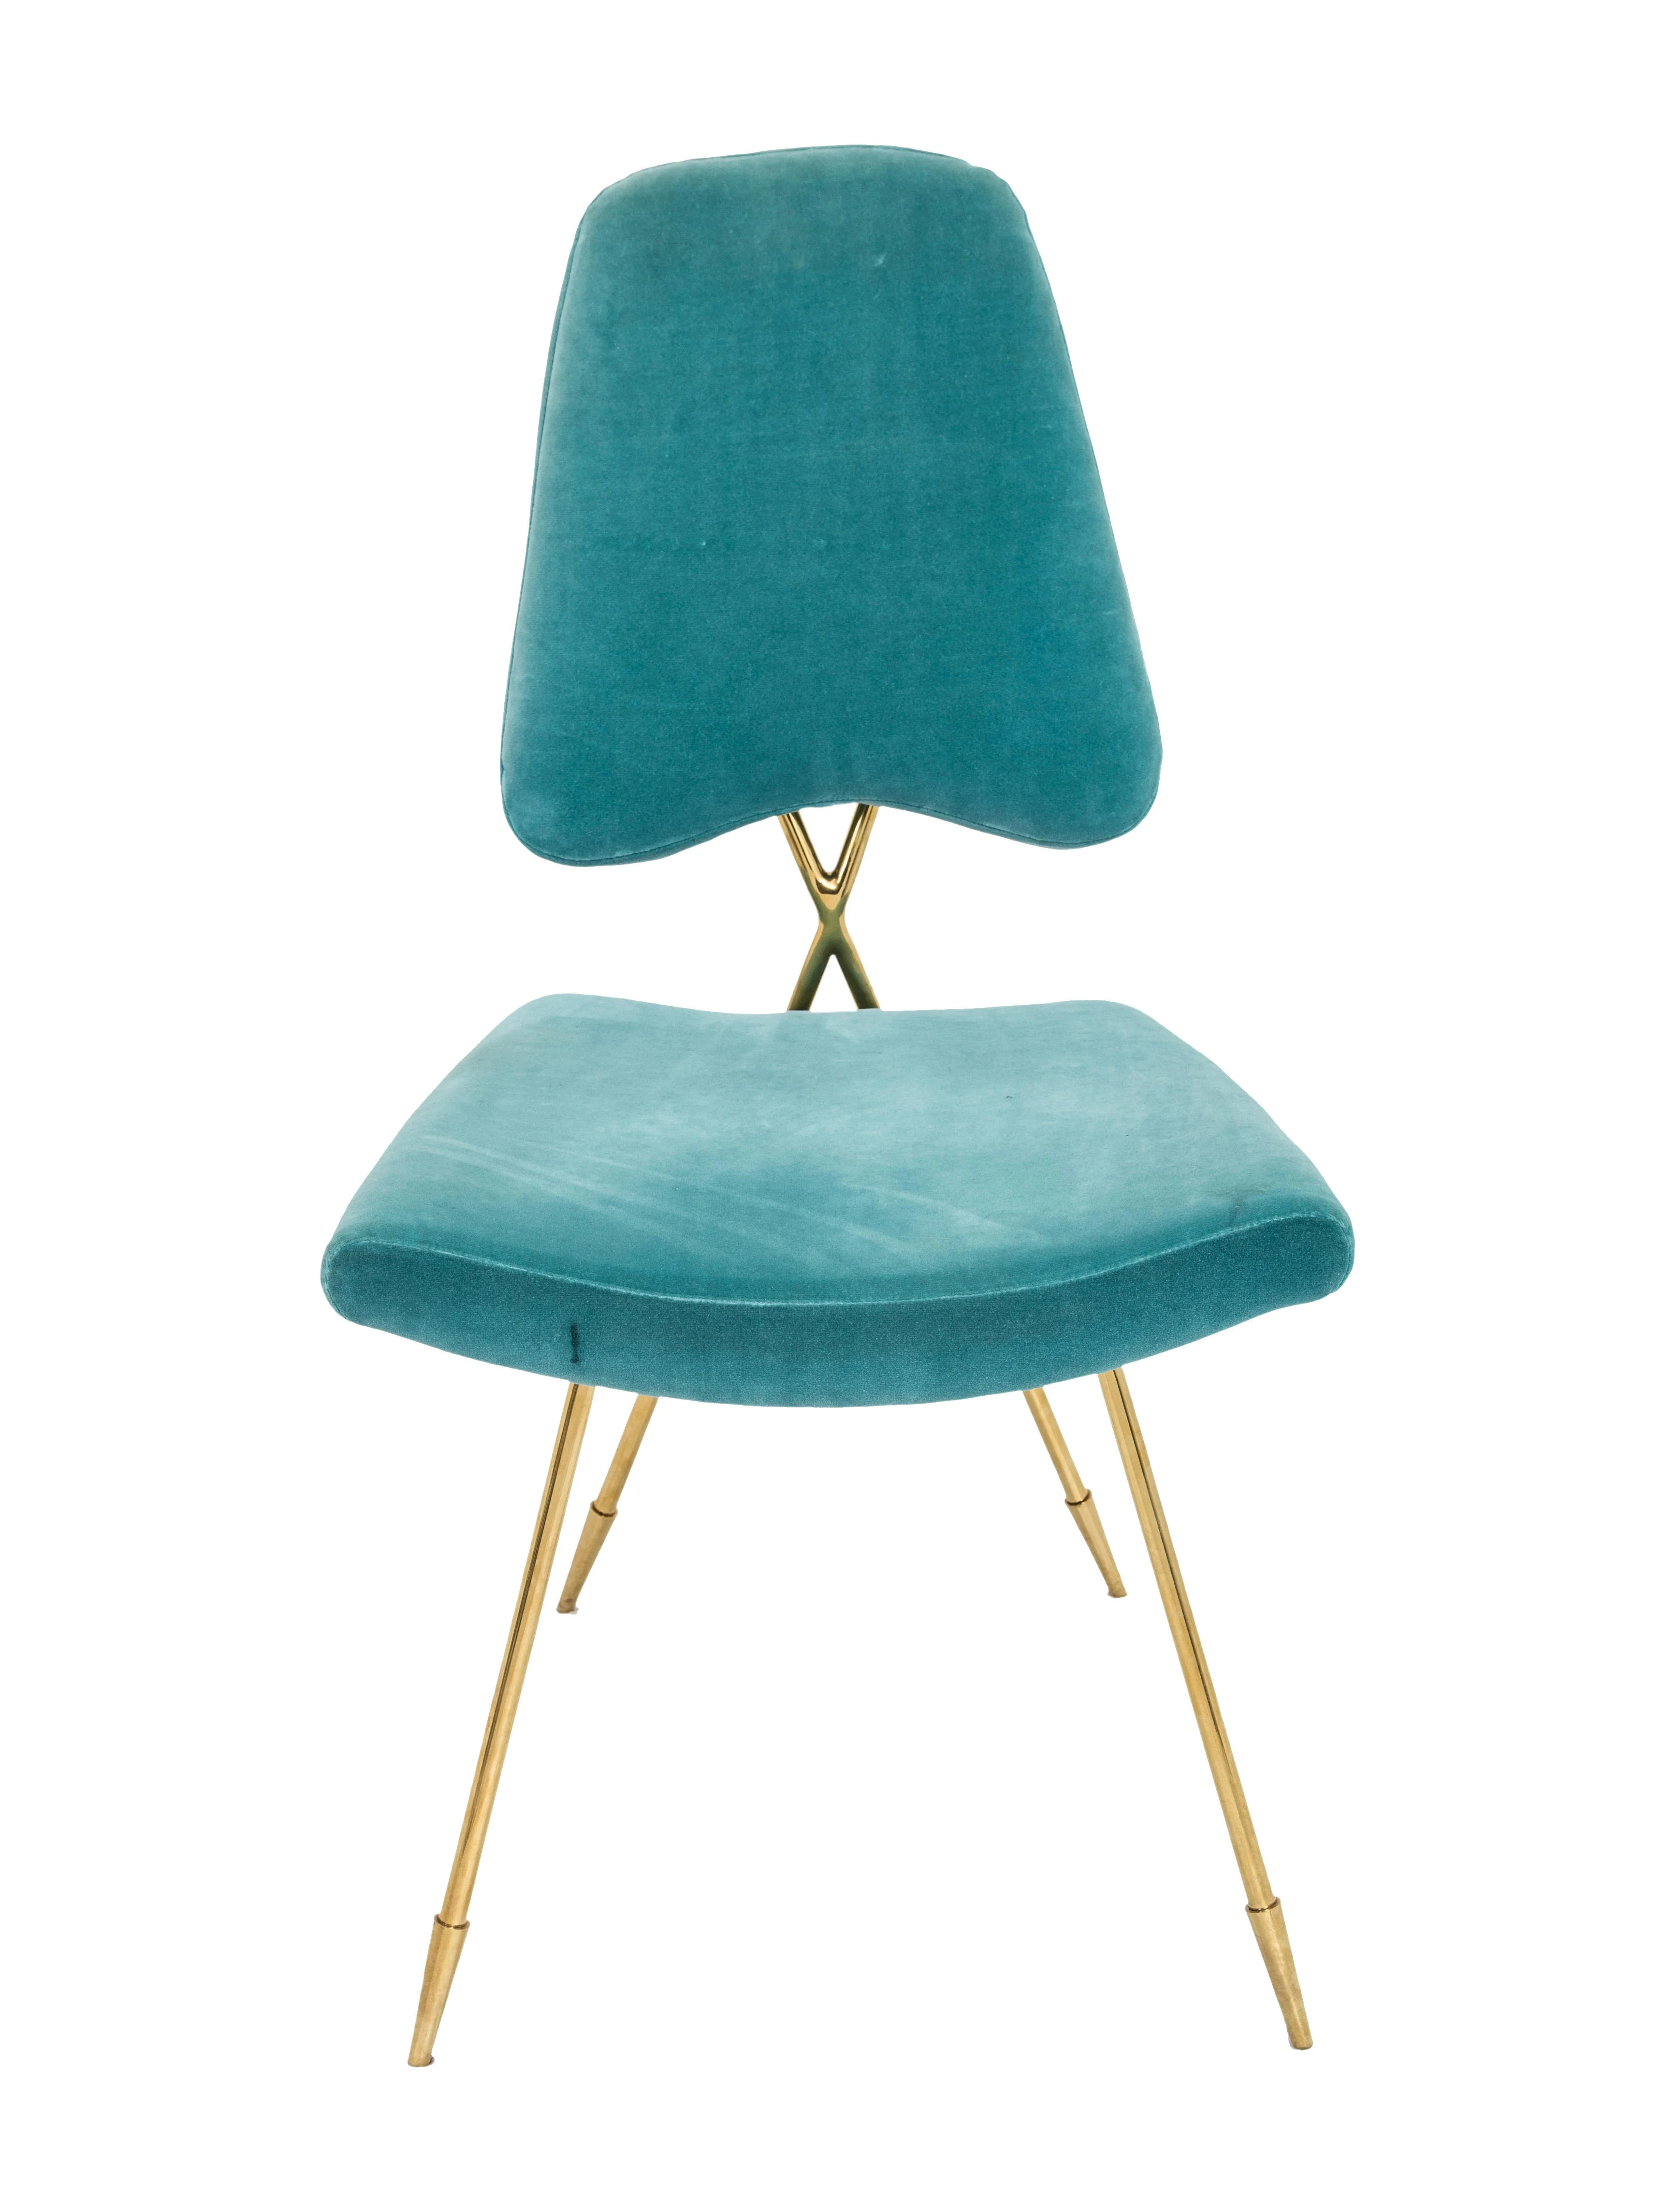 jonathan adler chair ergonomic standards maxime lounge furniture